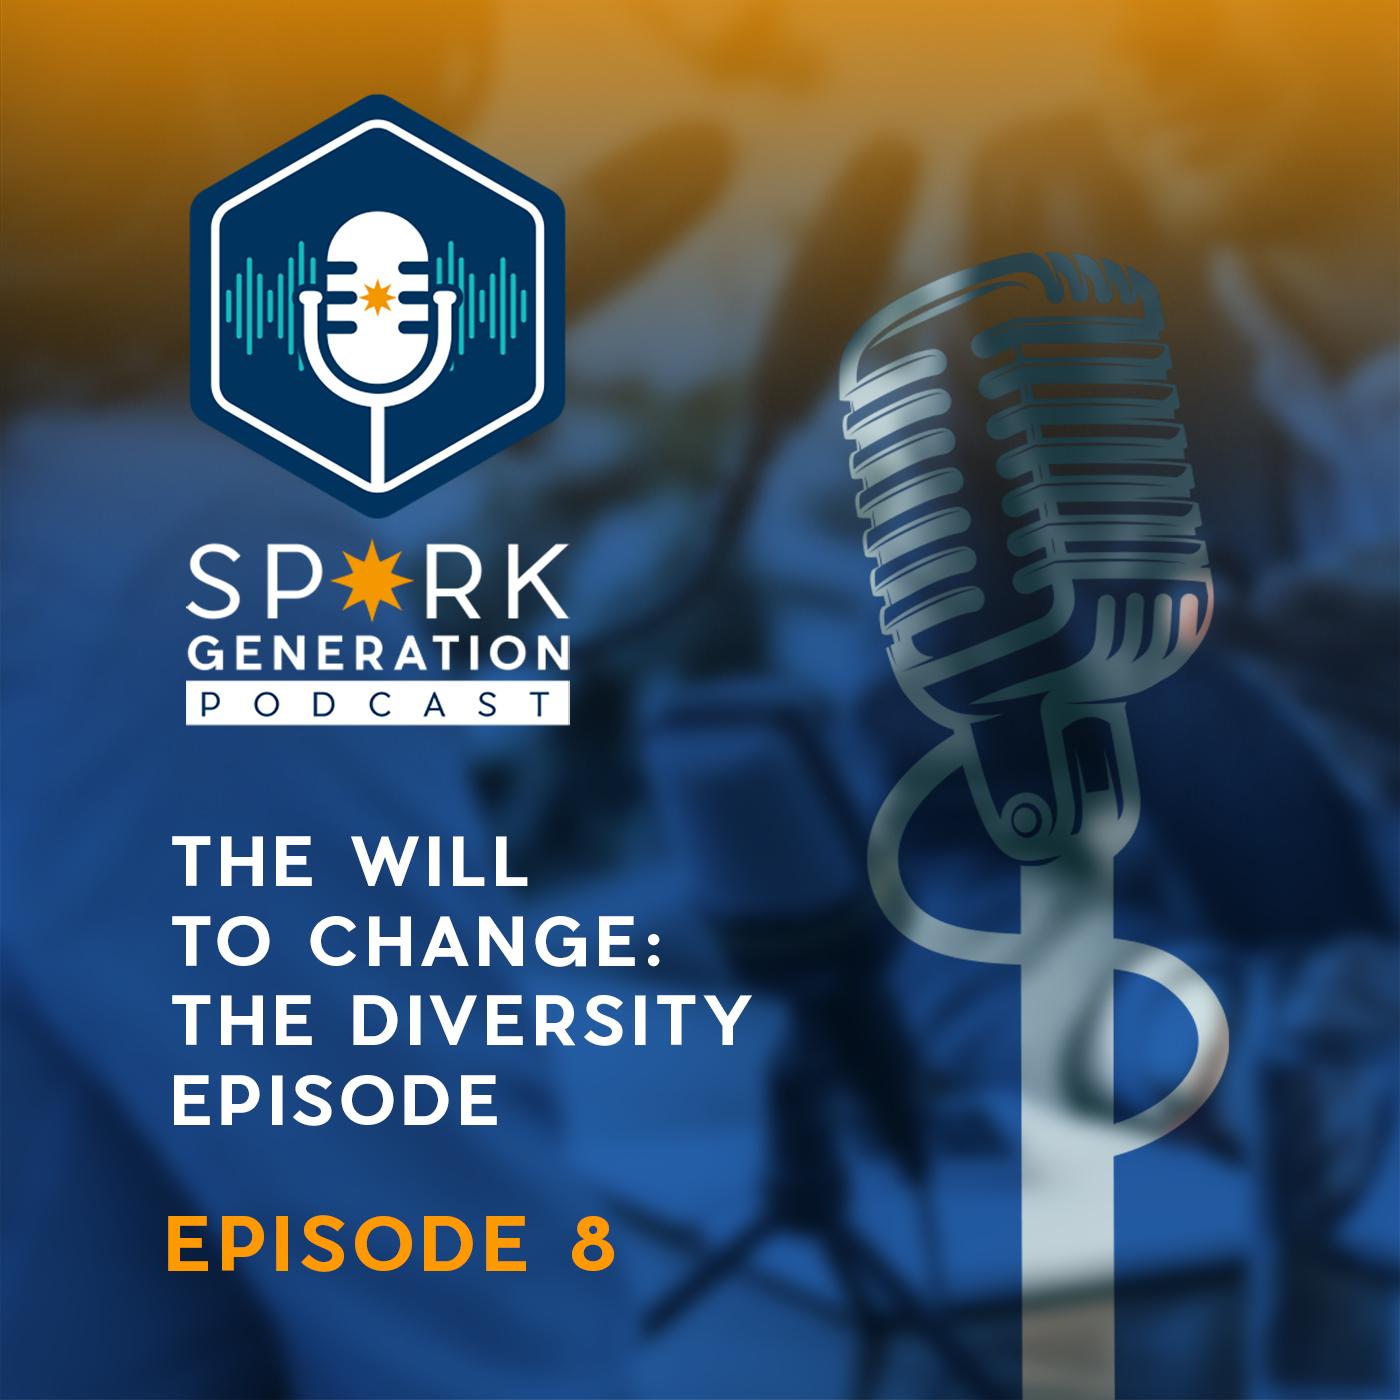 Artwork for podcast Spark Generation